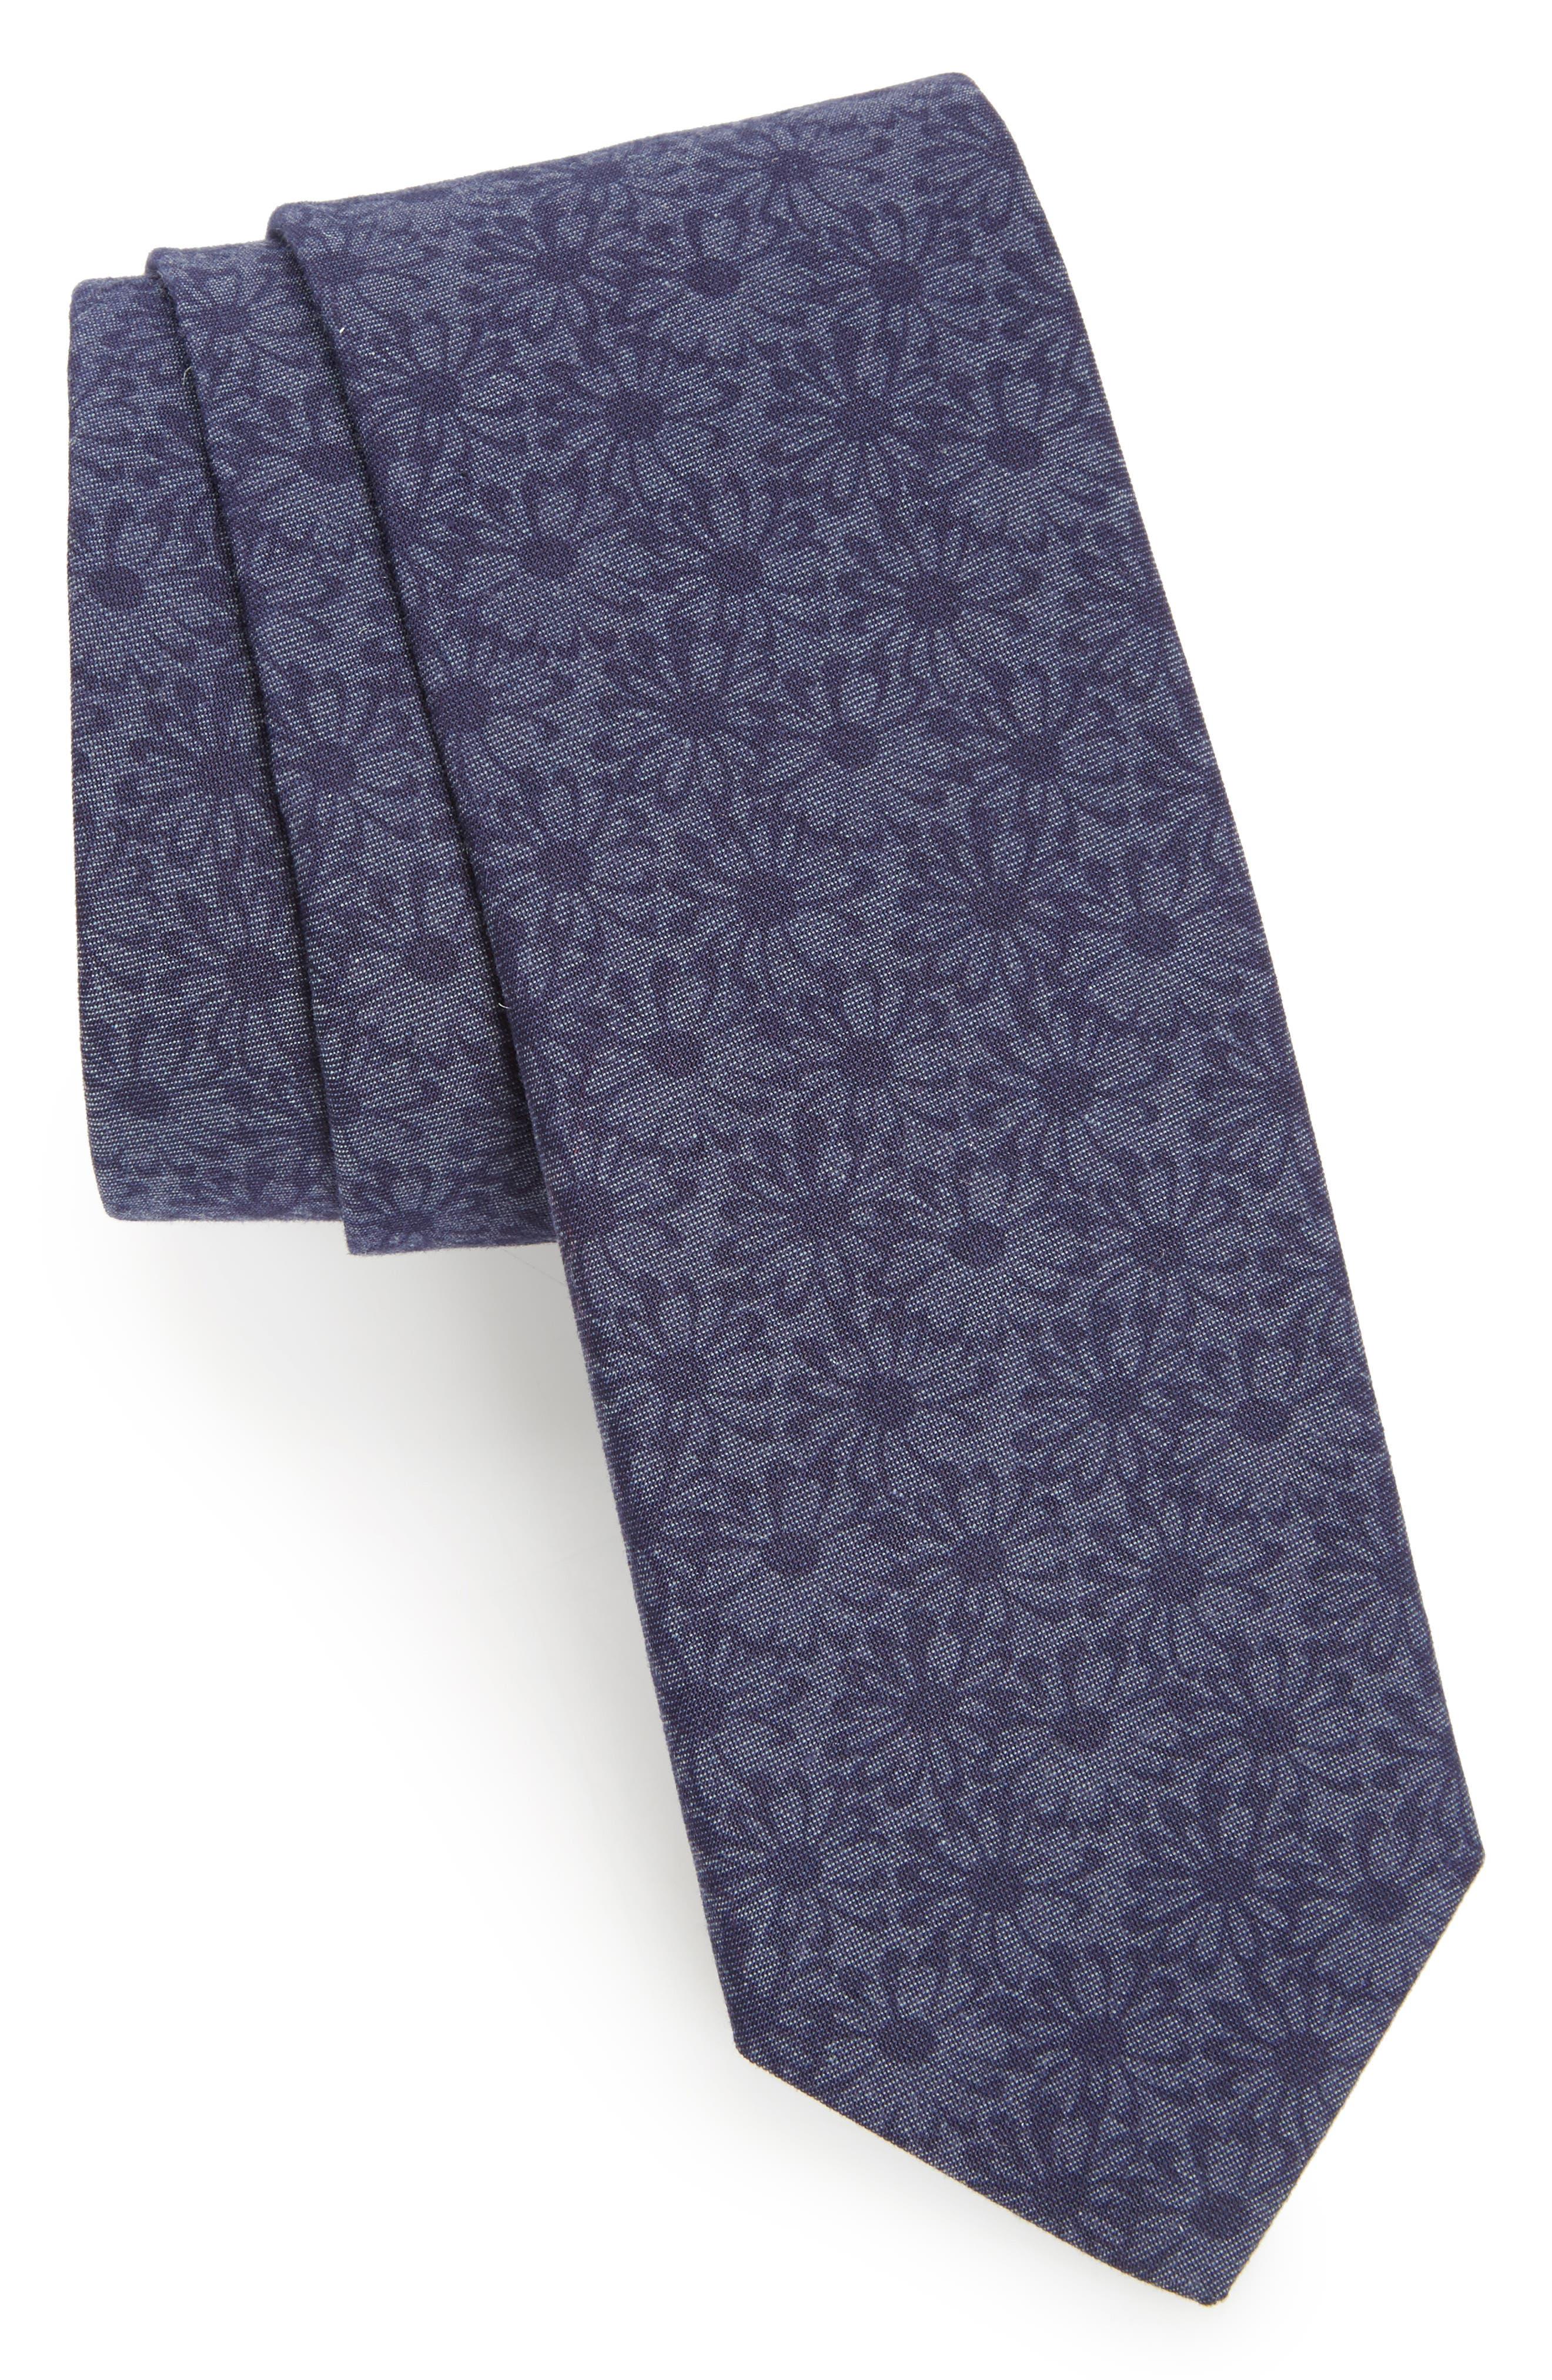 Floral Cotton Tie,                         Main,                         color, Navy/ Daisy